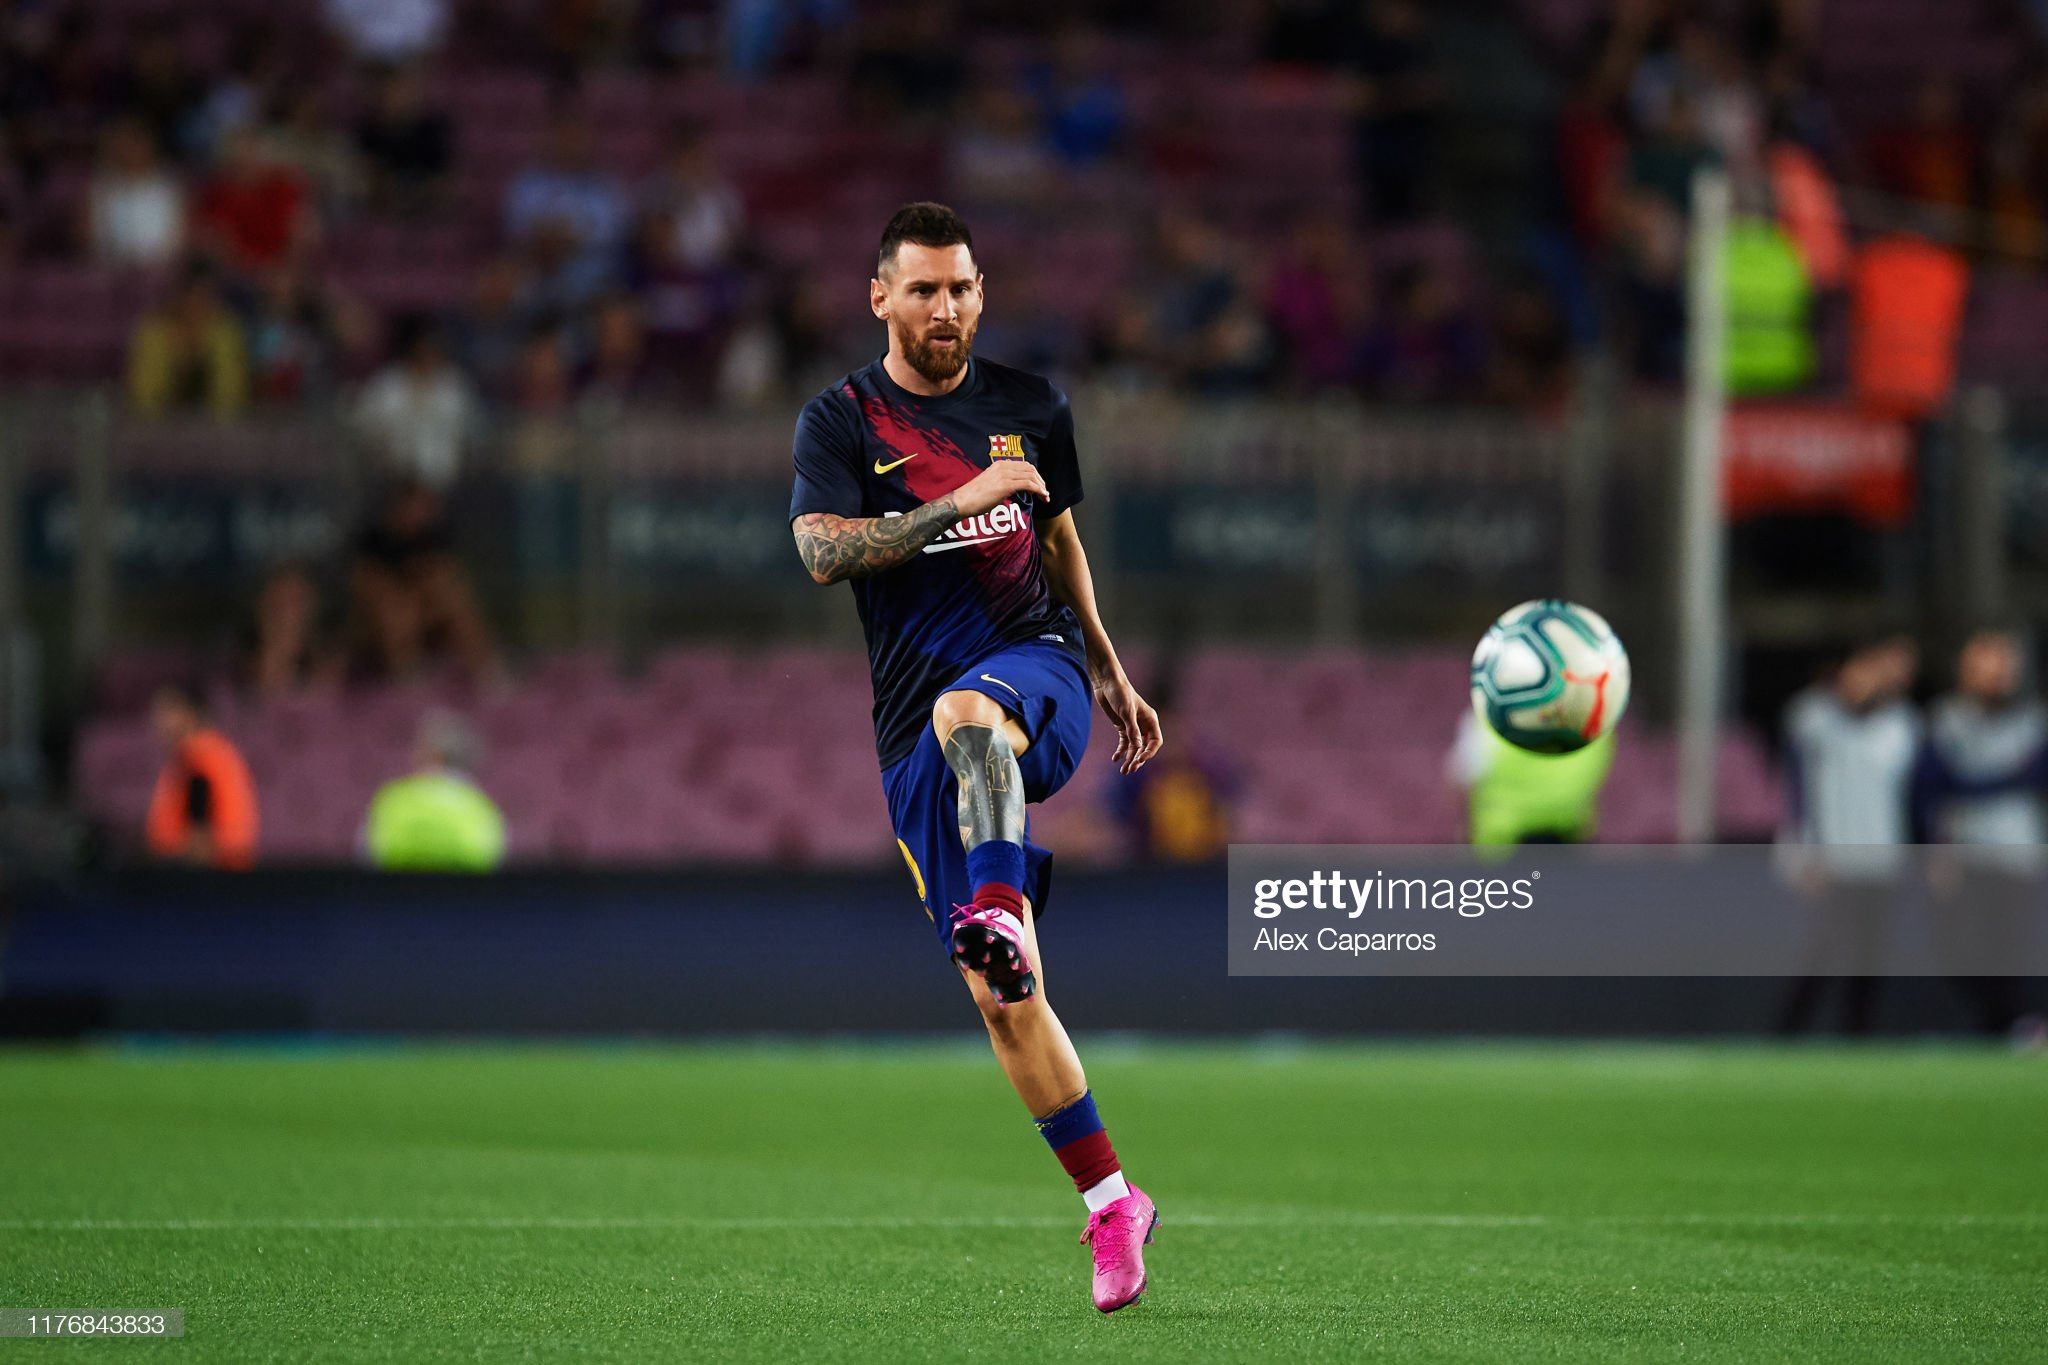 صور مباراة : برشلونة - فياريال 2-1 ( 24-09-2019 )  Lionel-messi-of-fc-barcelona-warms-up-before-the-liga-match-between-picture-id1176843833?s=2048x2048